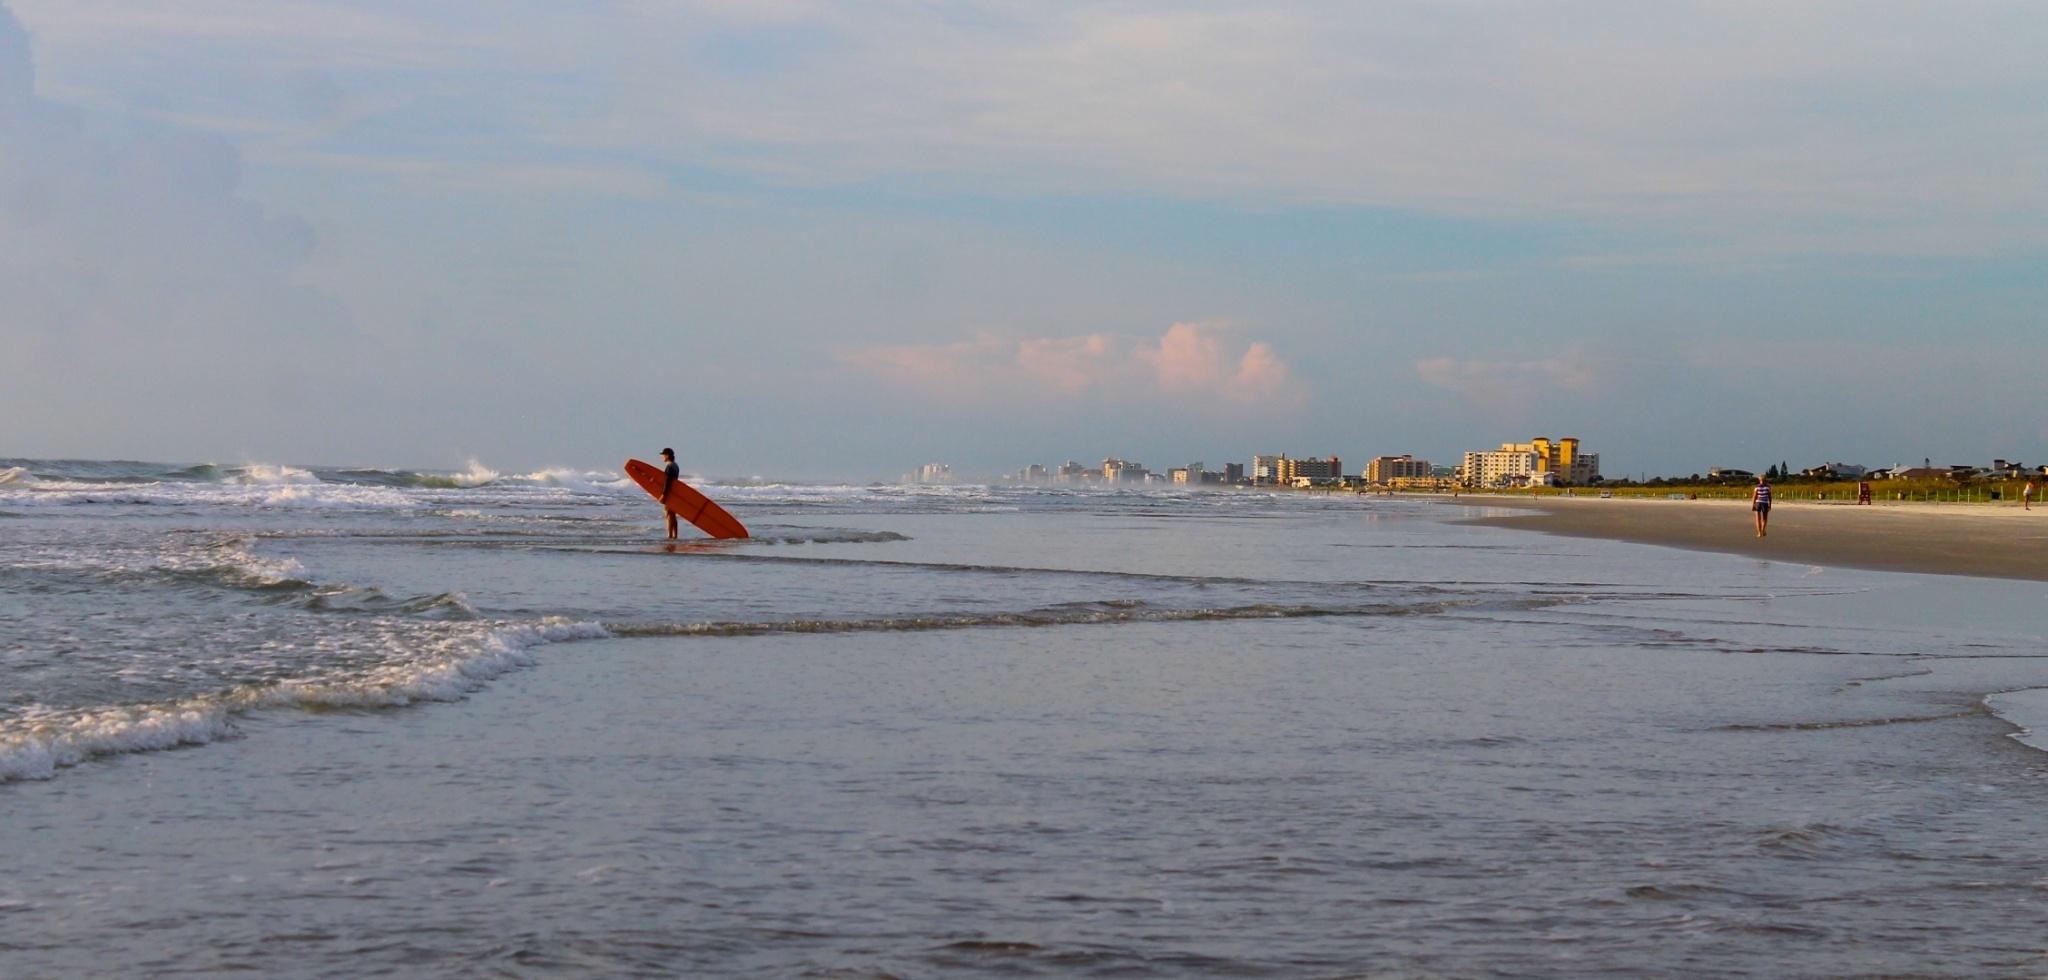 New Smyrna Beach surfer at sunrise